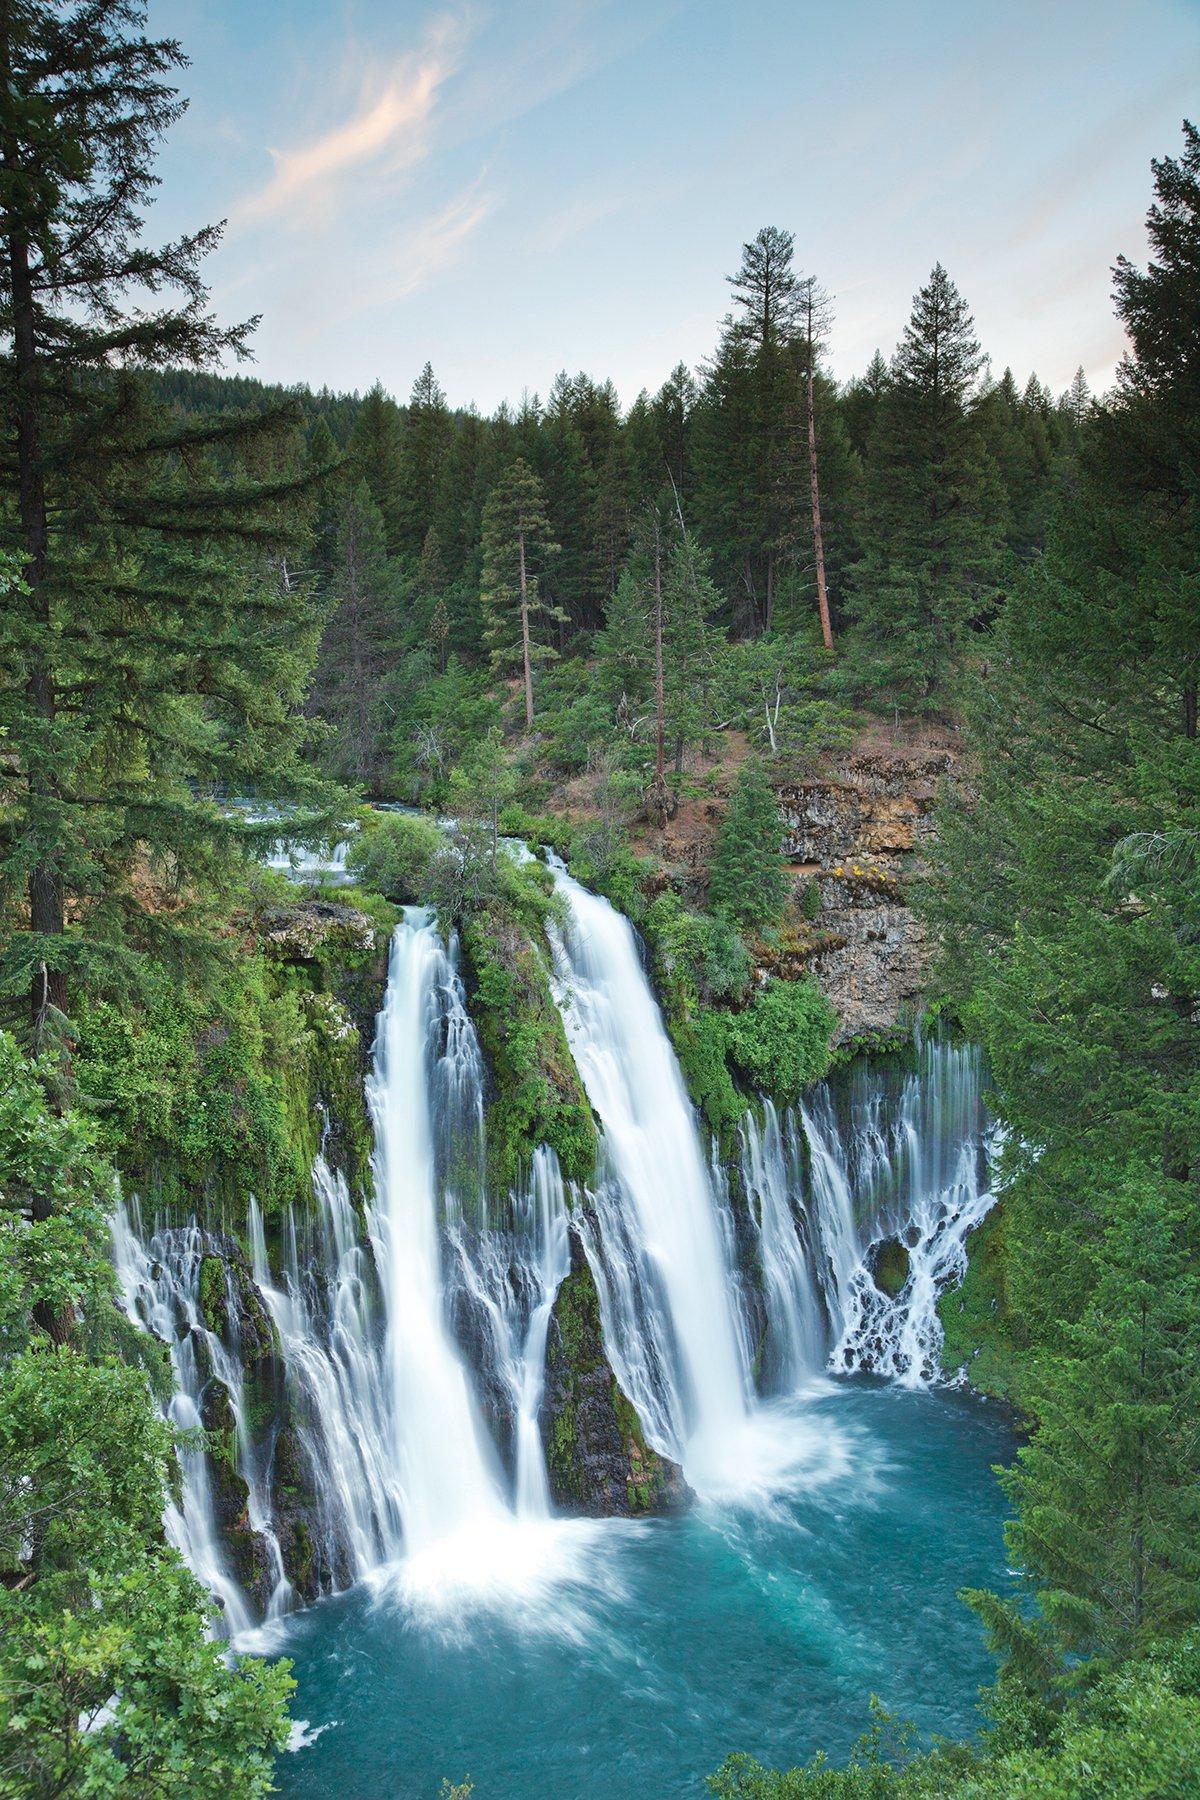 Burney Falls HD wallpapers, Desktop wallpaper - most viewed